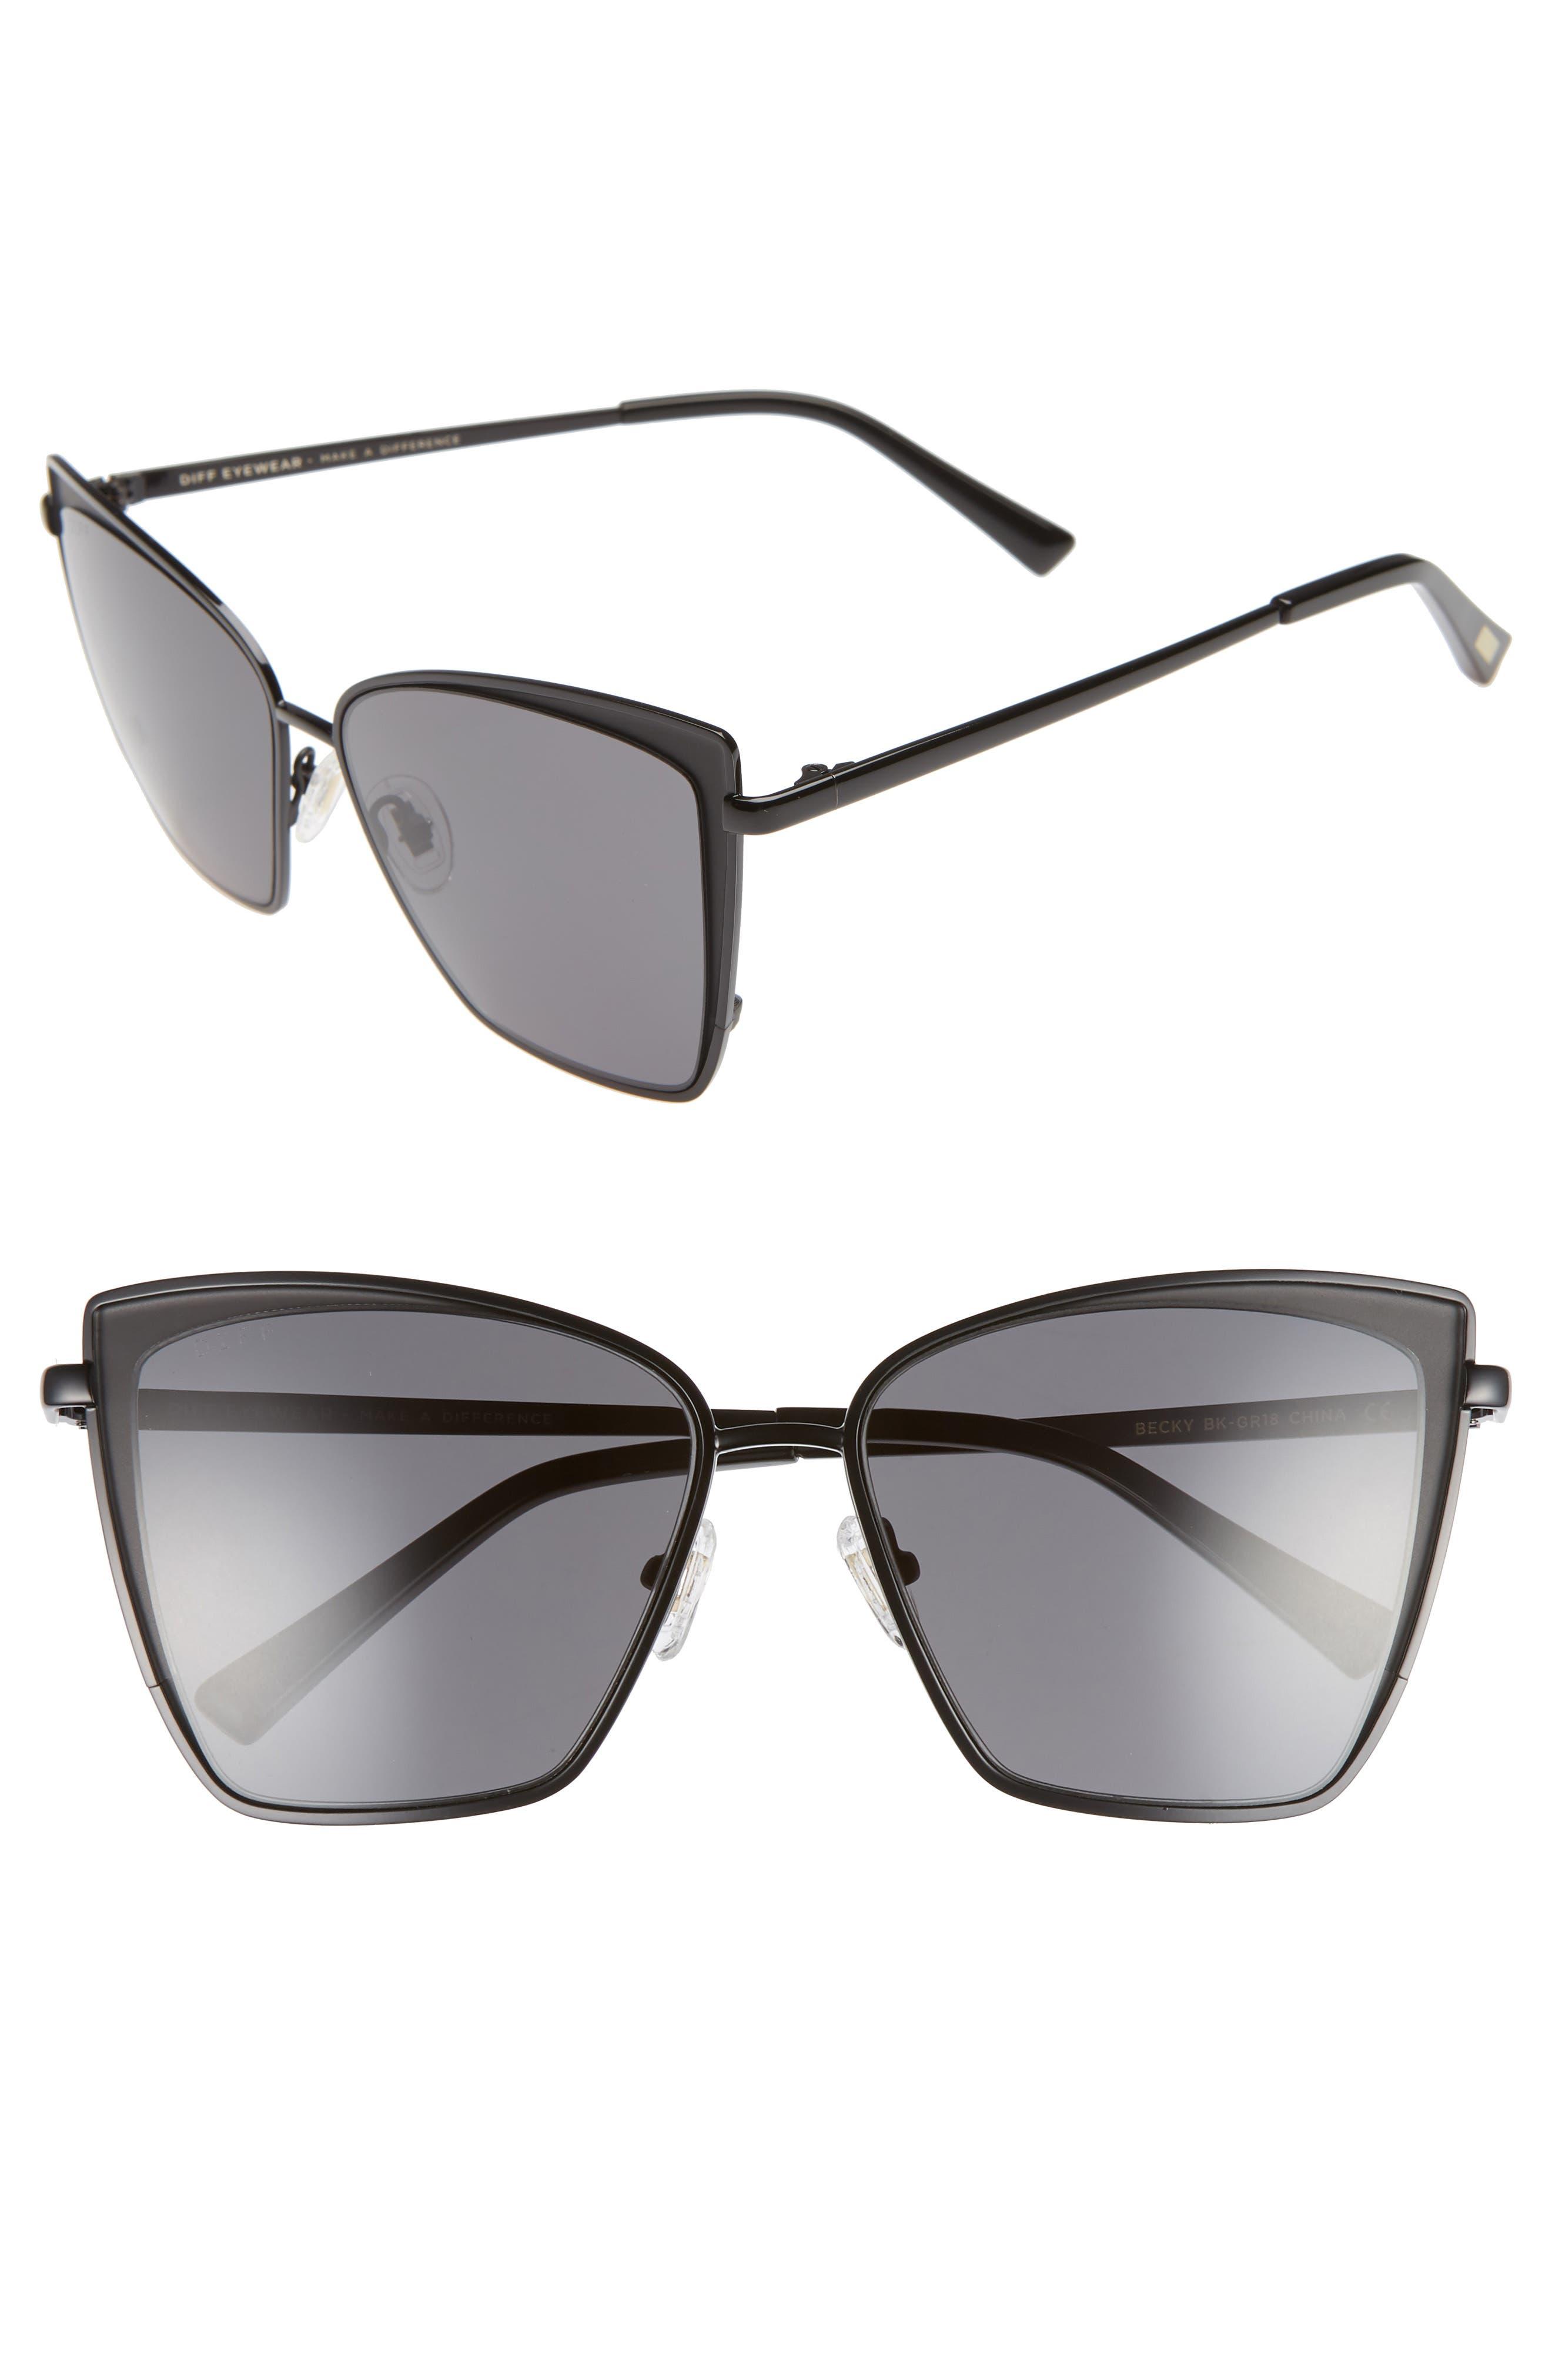 6b31ae06a4 DIFF Sunglasses for Women